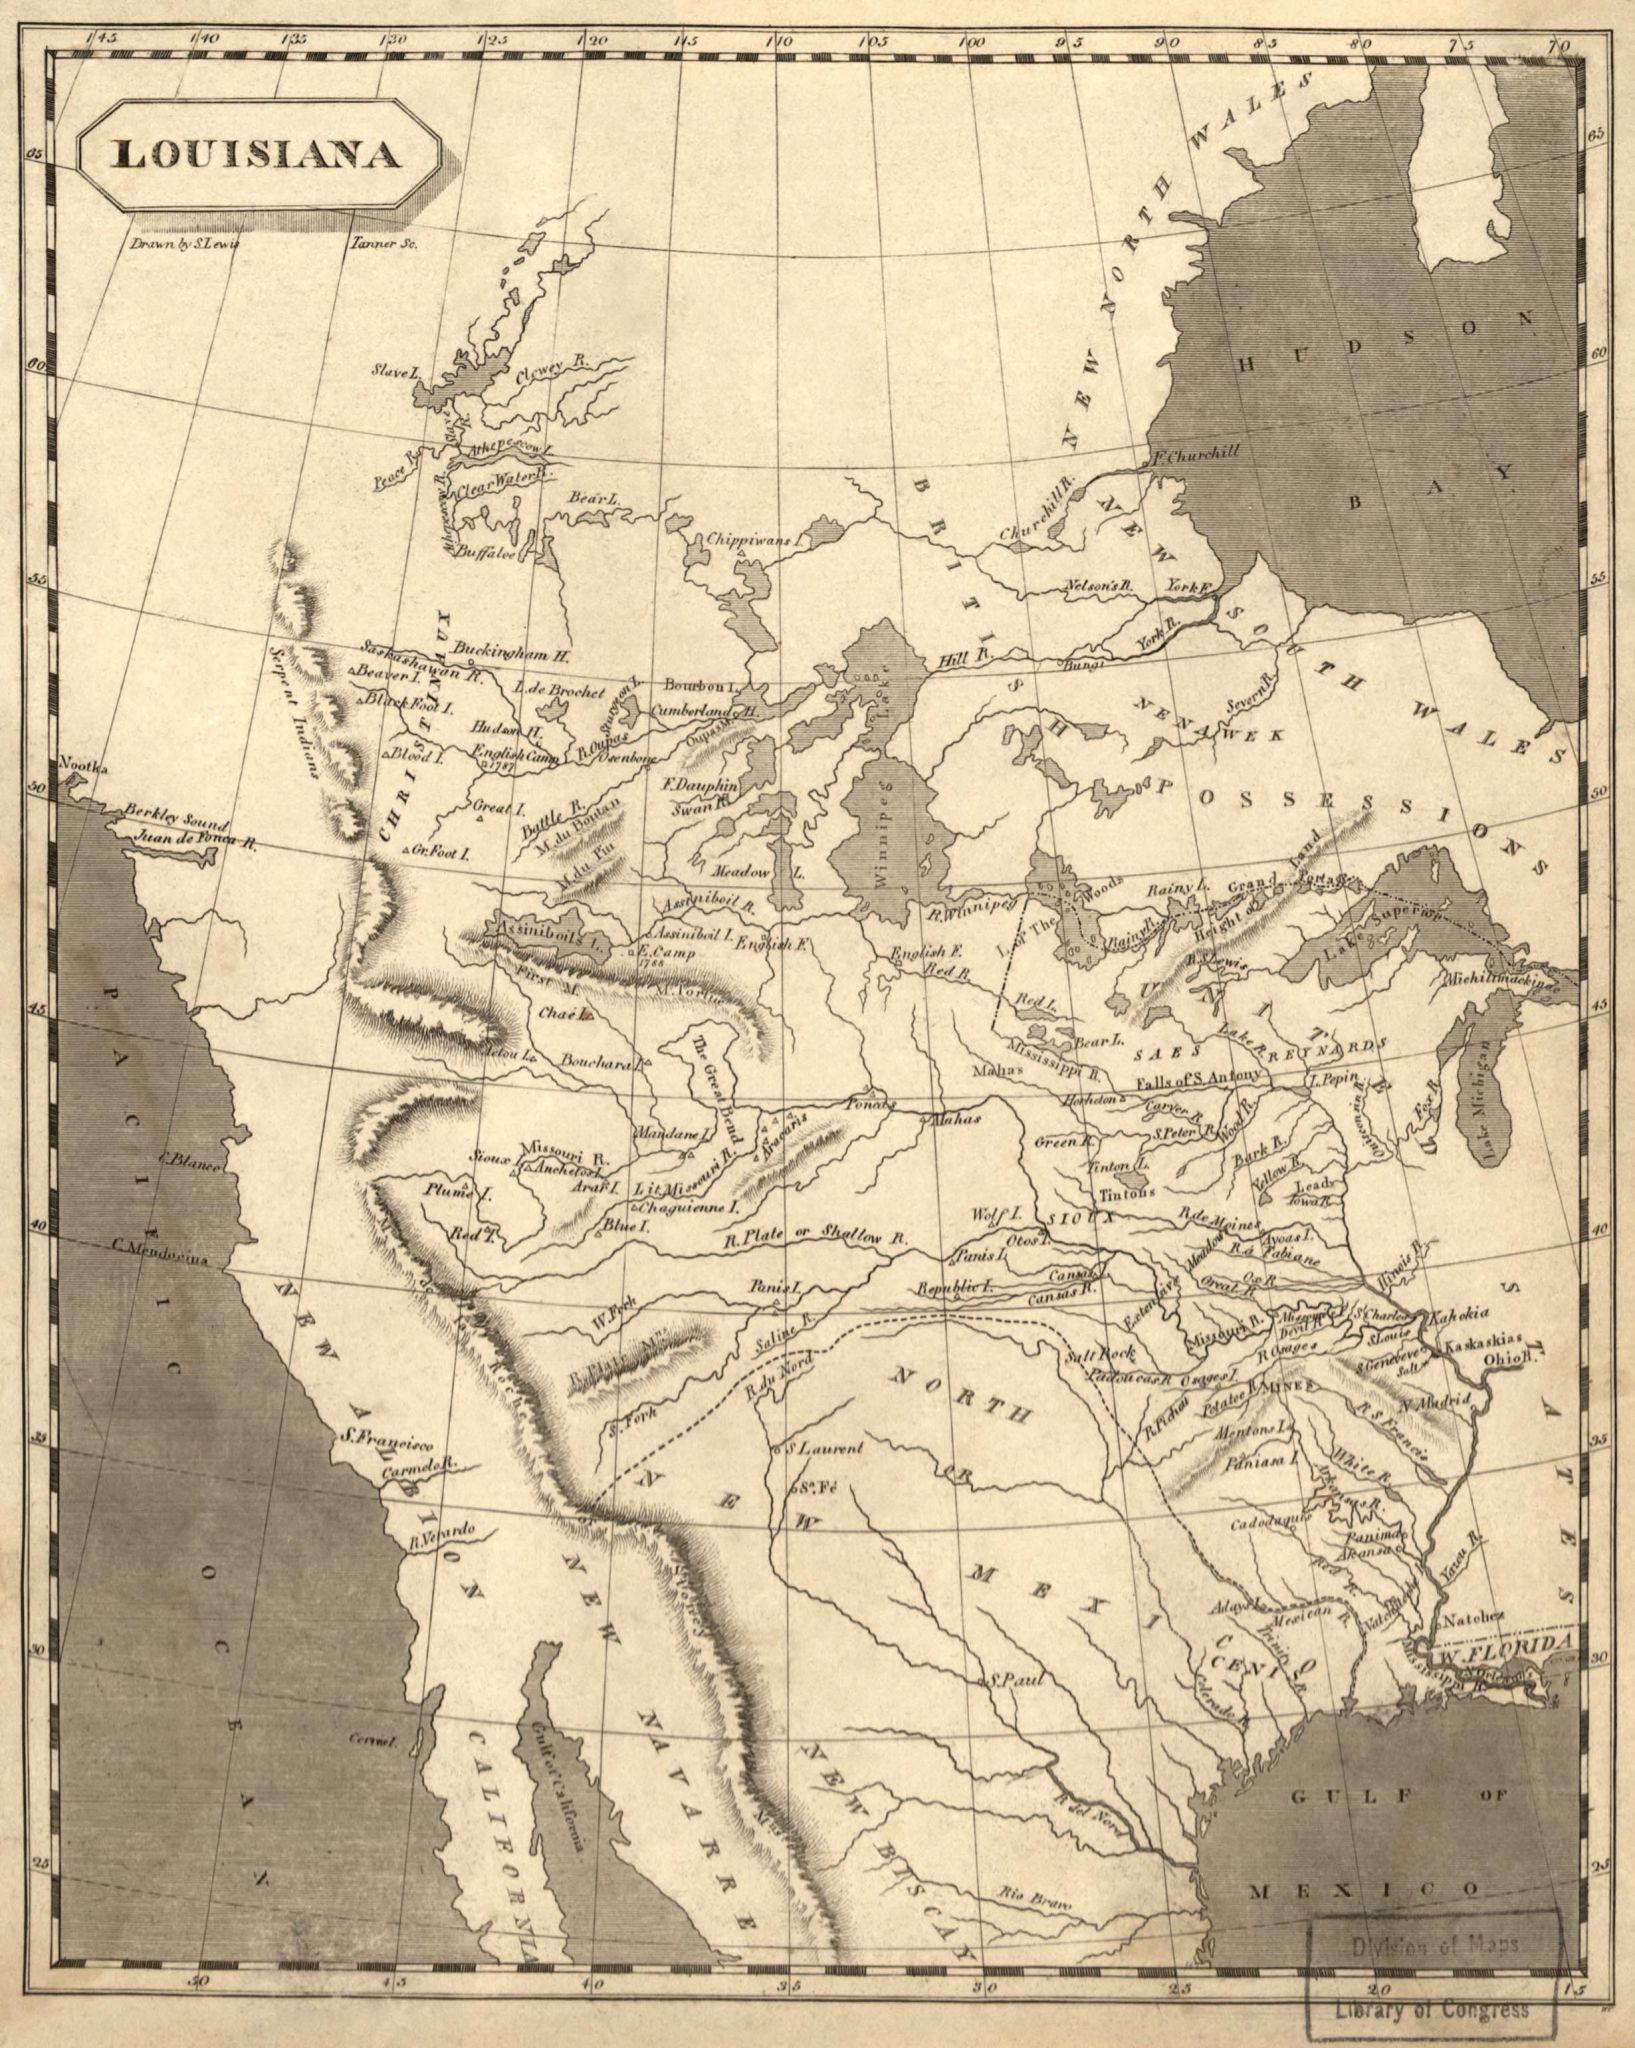 Louisiana Purchase Map Activity Worksheet